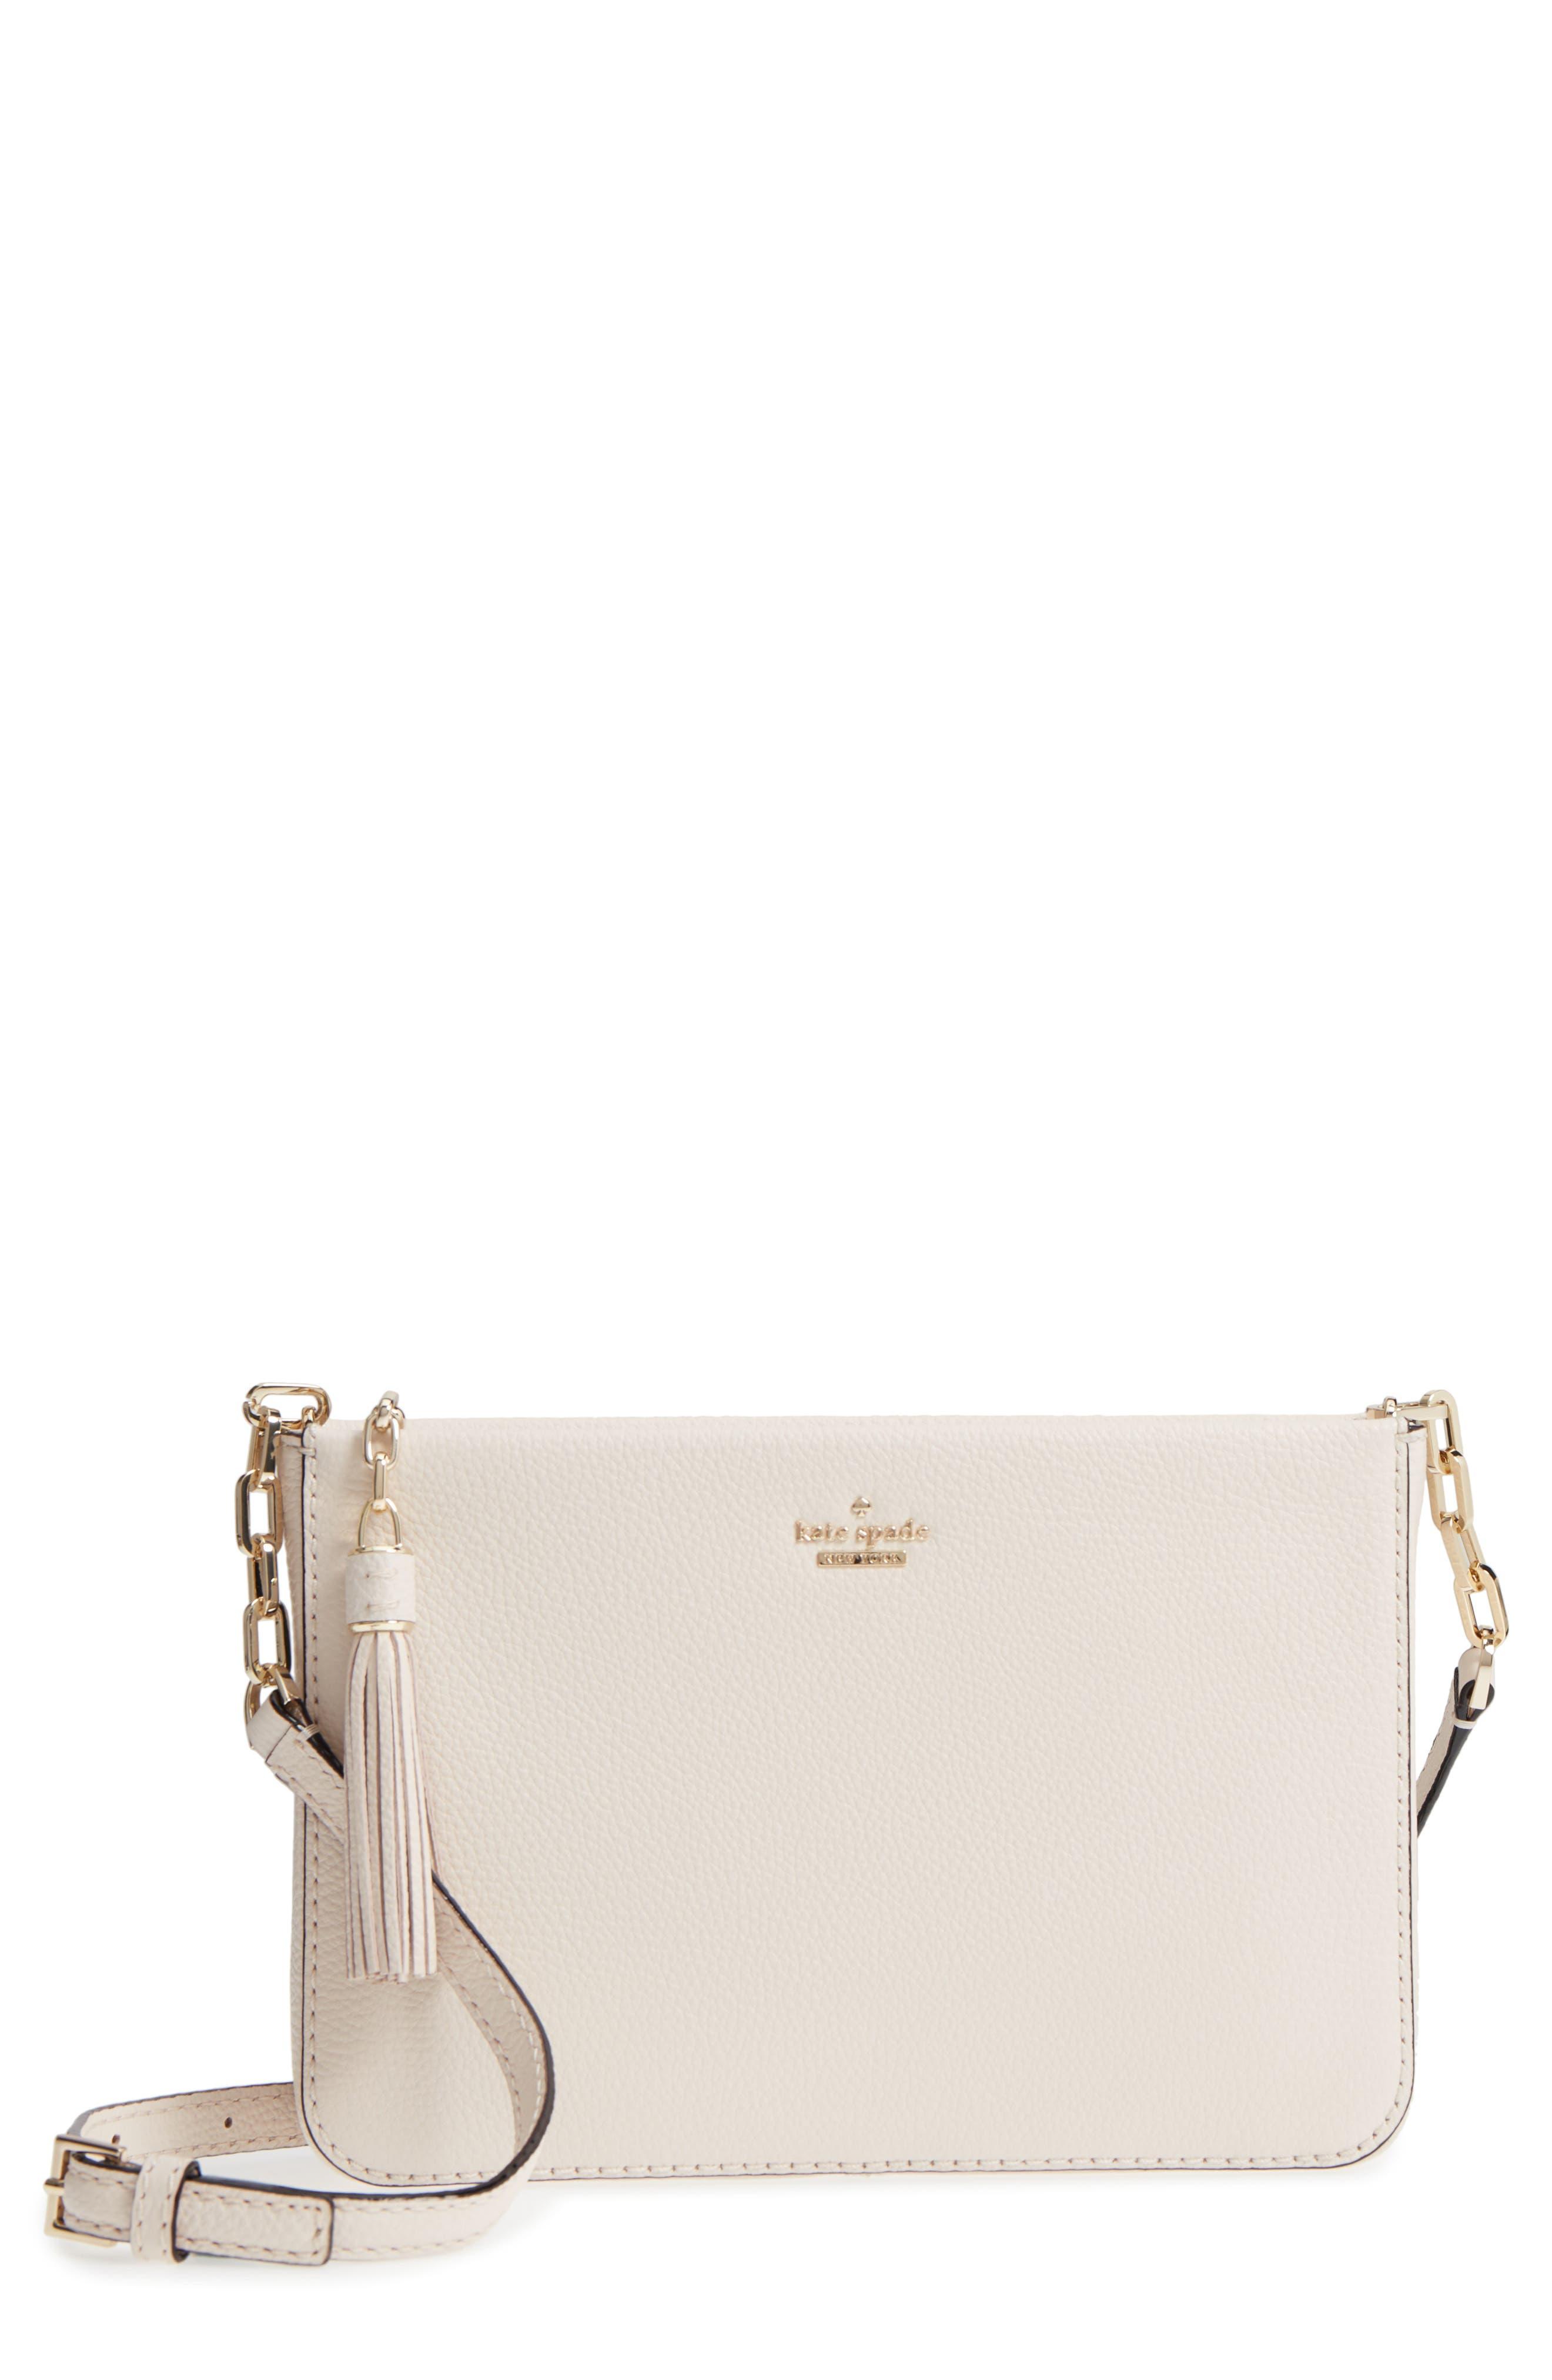 kate spade new york kingston drive - alessa leather shoulder/crossbody bag